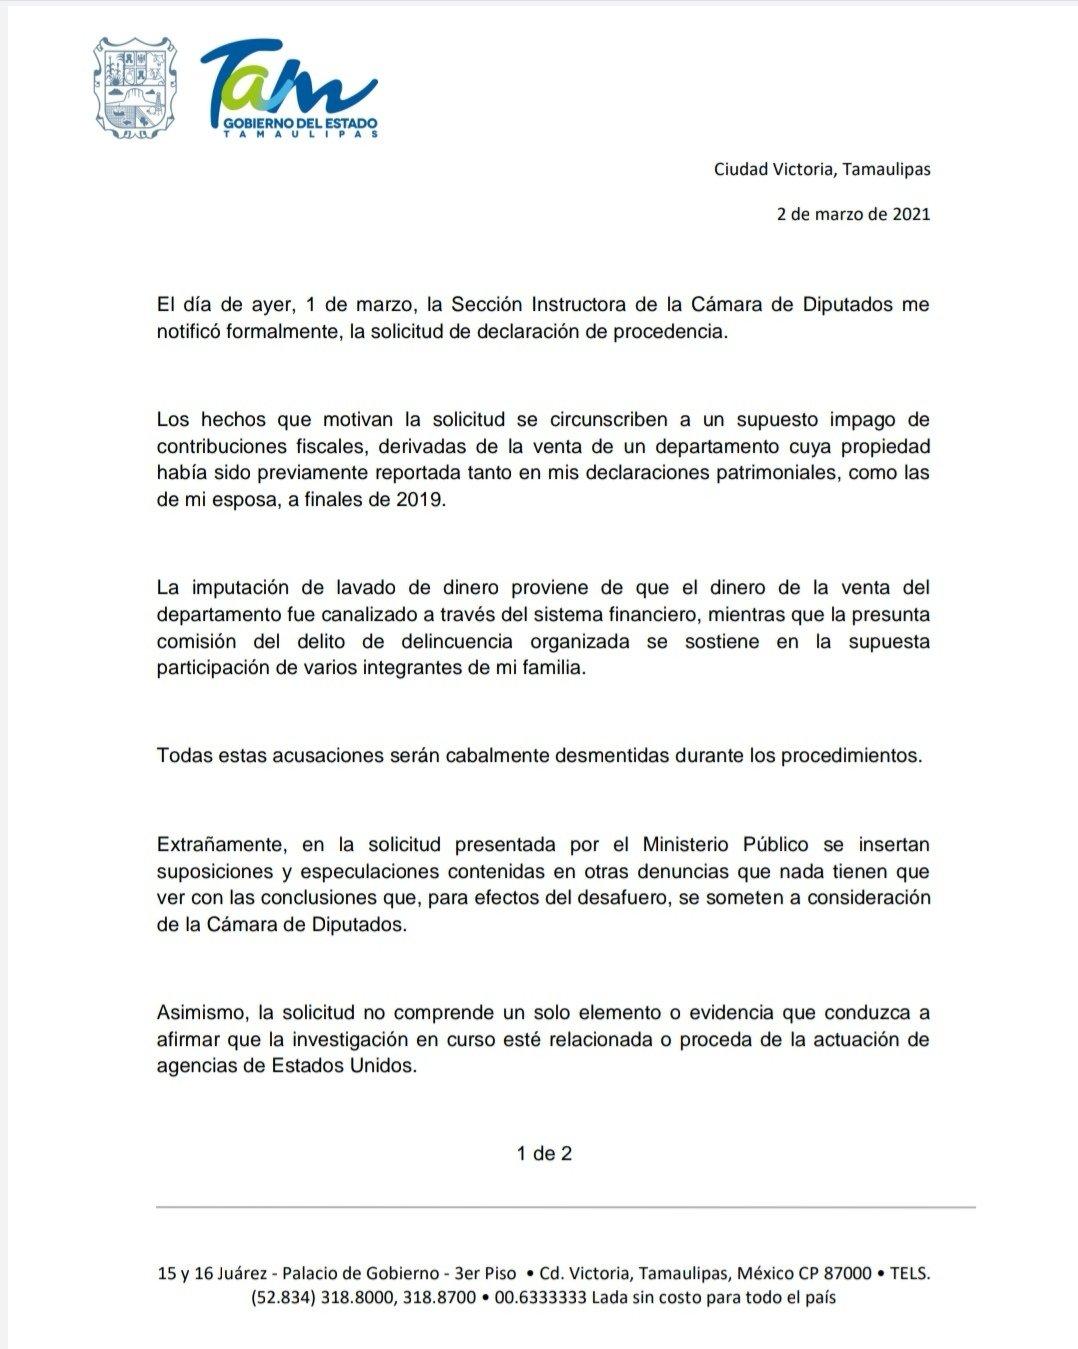 GOBERNADOR DE TAMAULIPAS DA SU POSTURA A SEÑALAMIENTOS PARA DESAFUERO